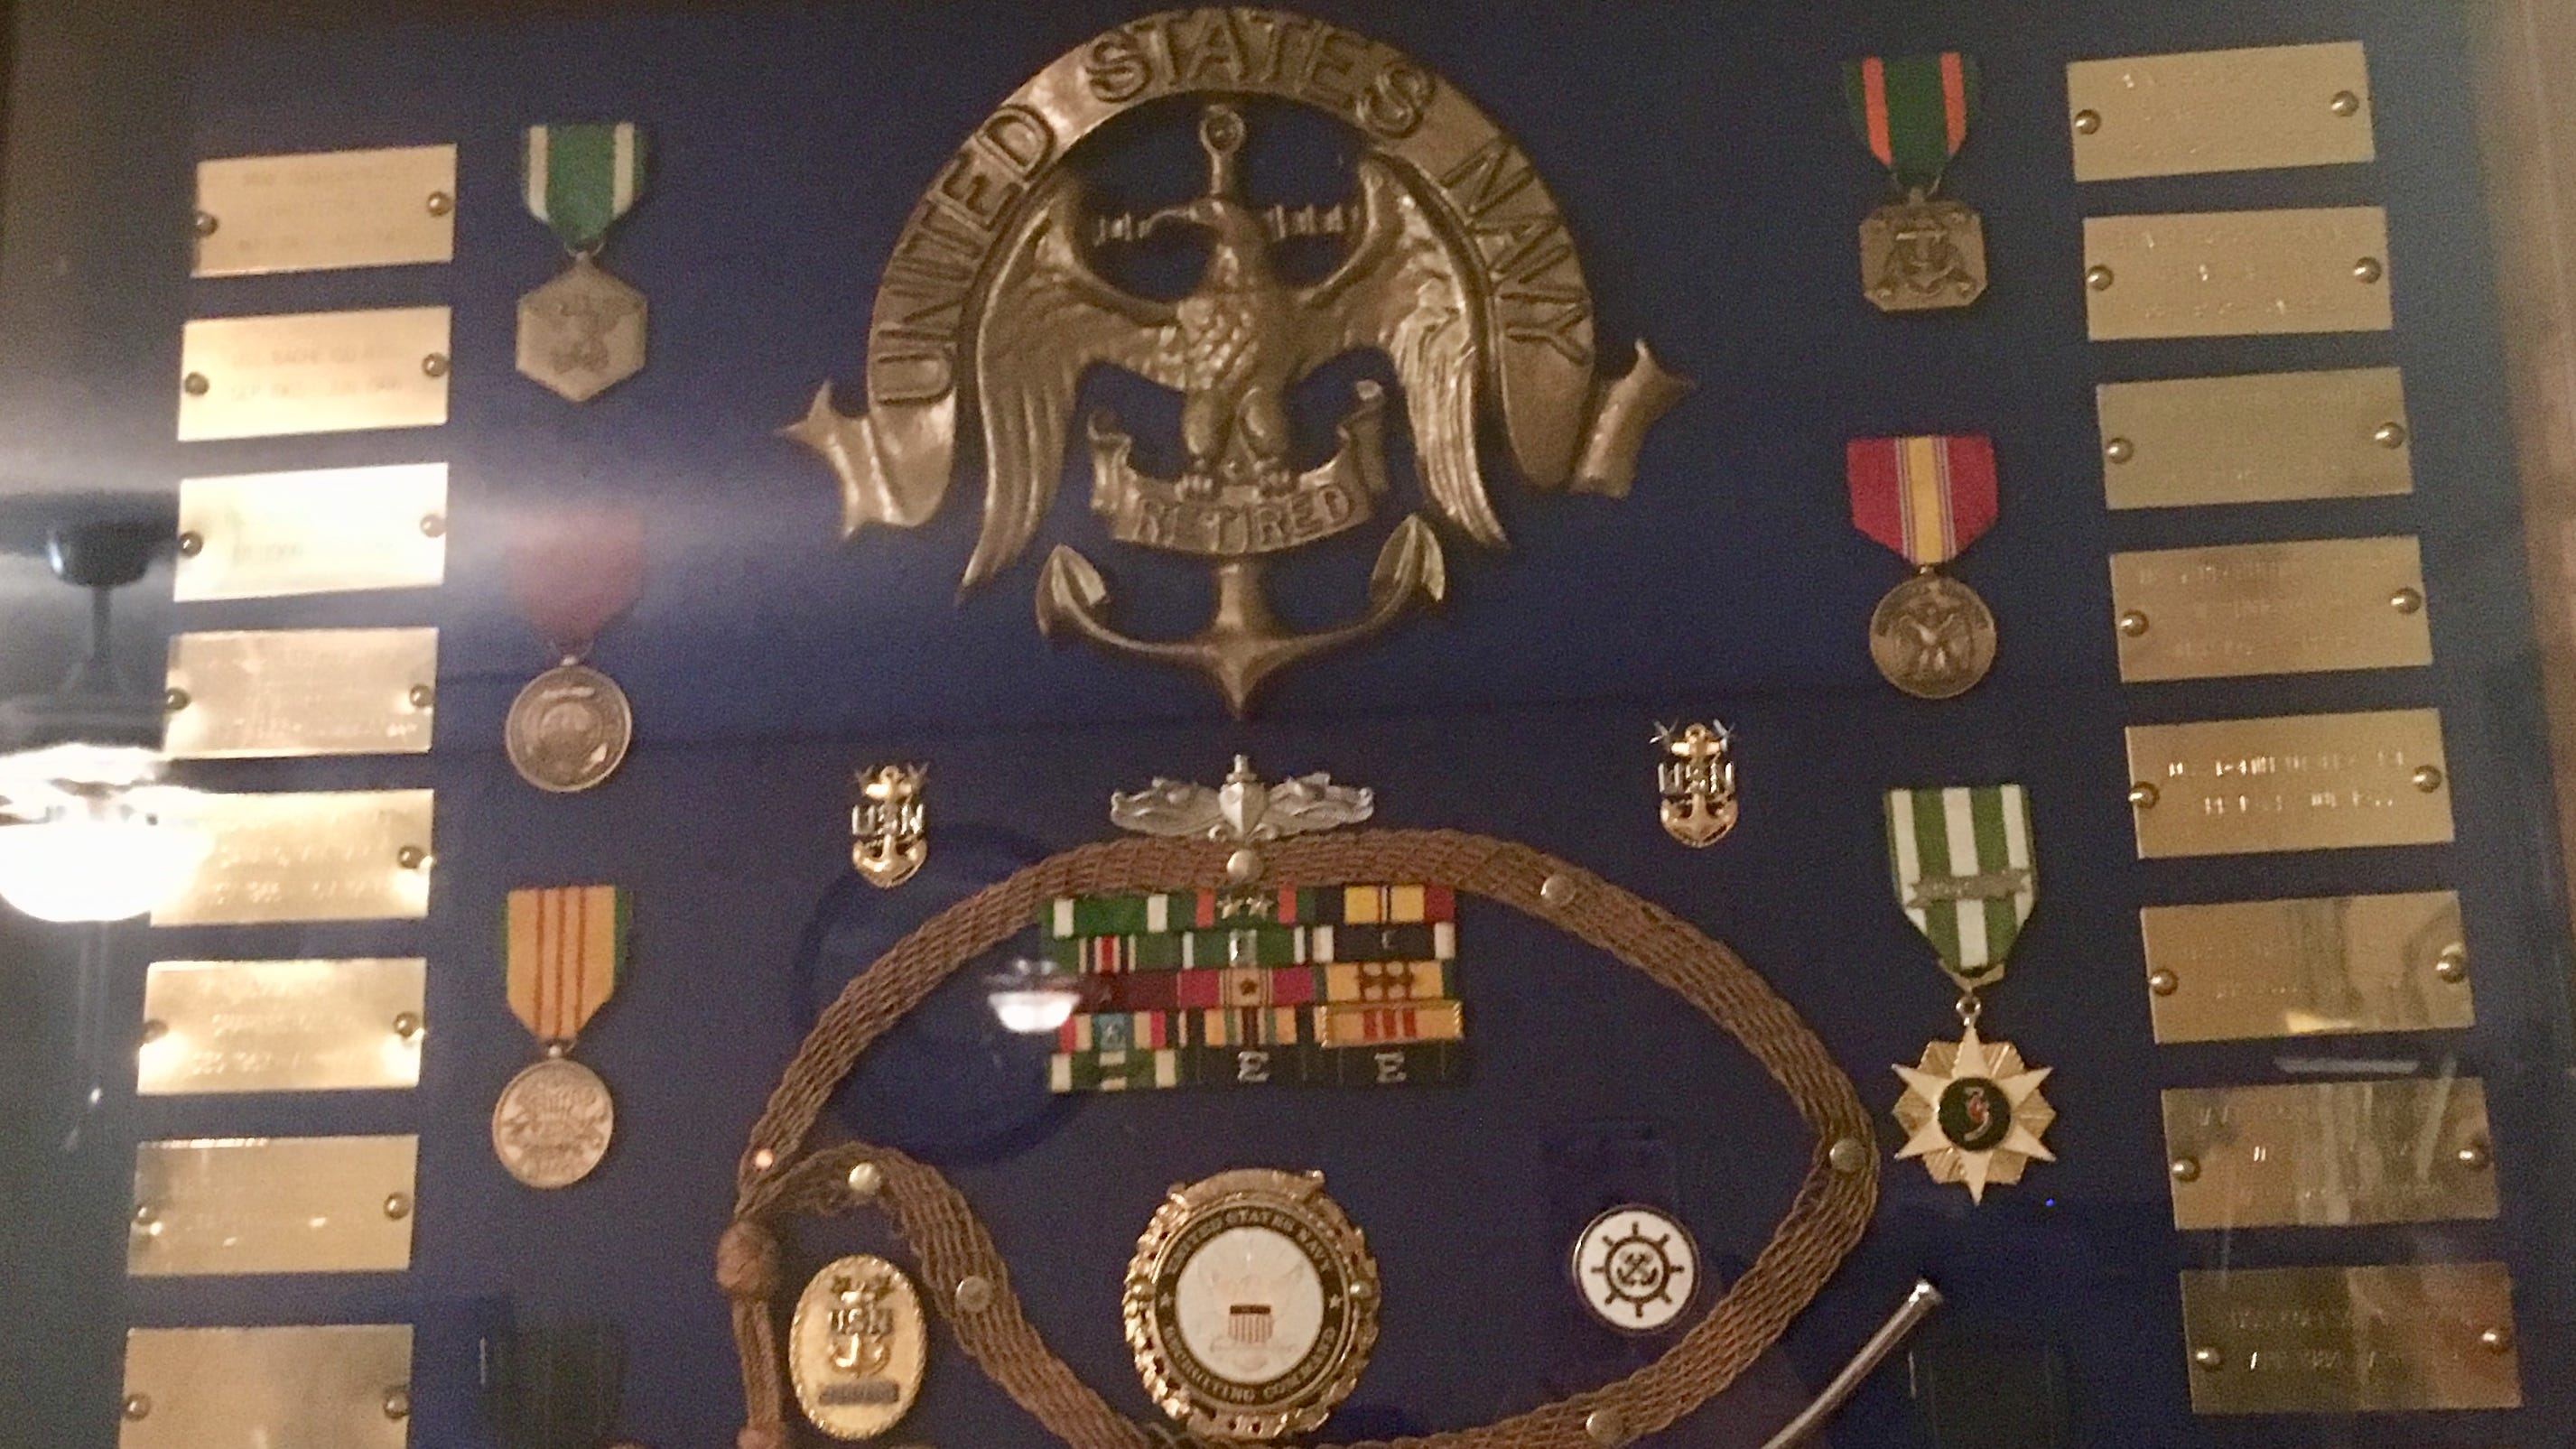 Vietnam veteran files federal lawsuit against Louisiana VA office director